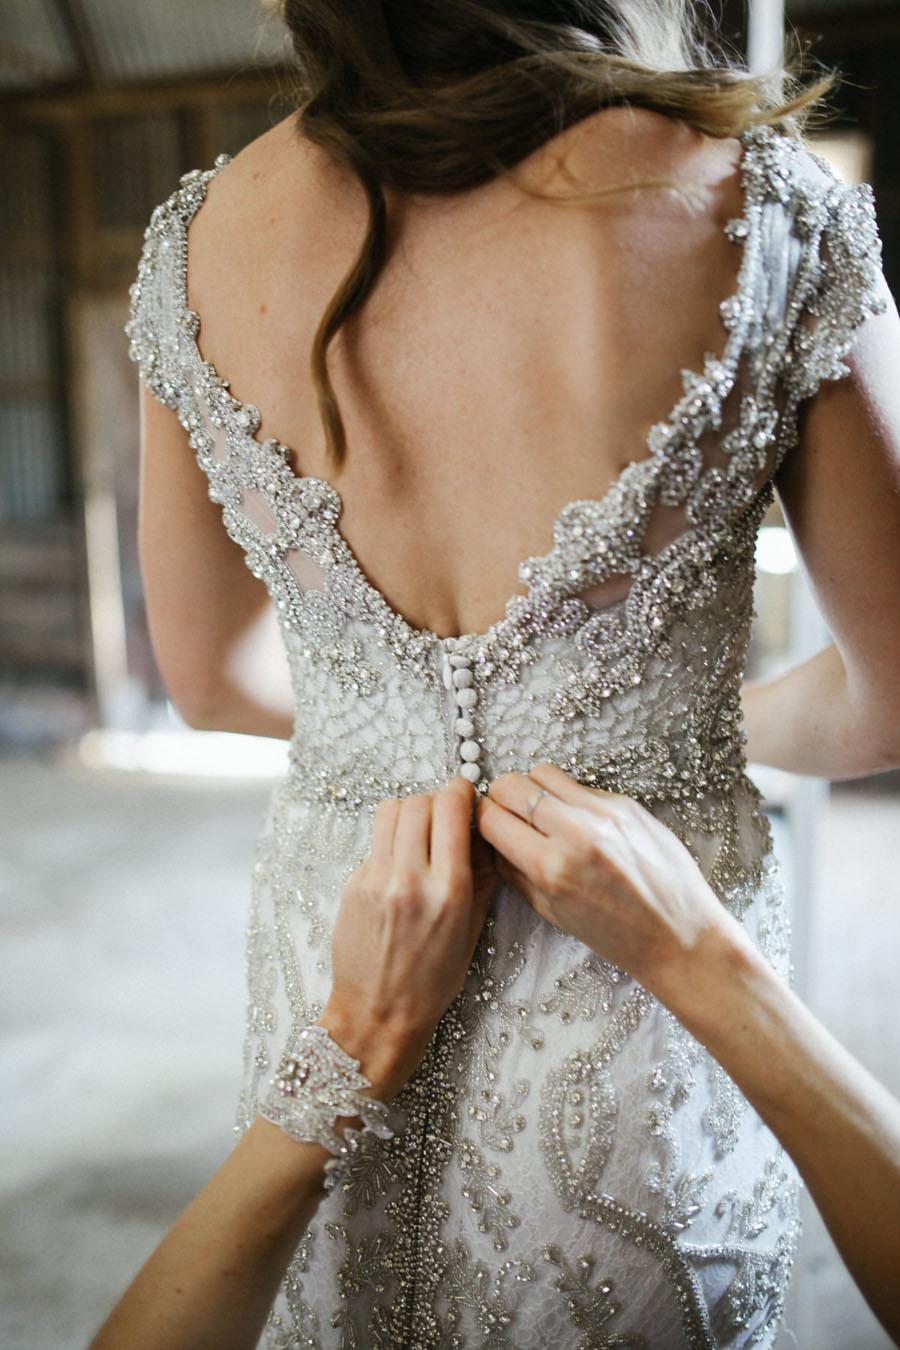 Uncategorized/outdoor vintage glam wedding rustic wedding chic - Amazing Wedding Dress Designer Anna Campbell S Rustic Glam Wedding Bridalpulse